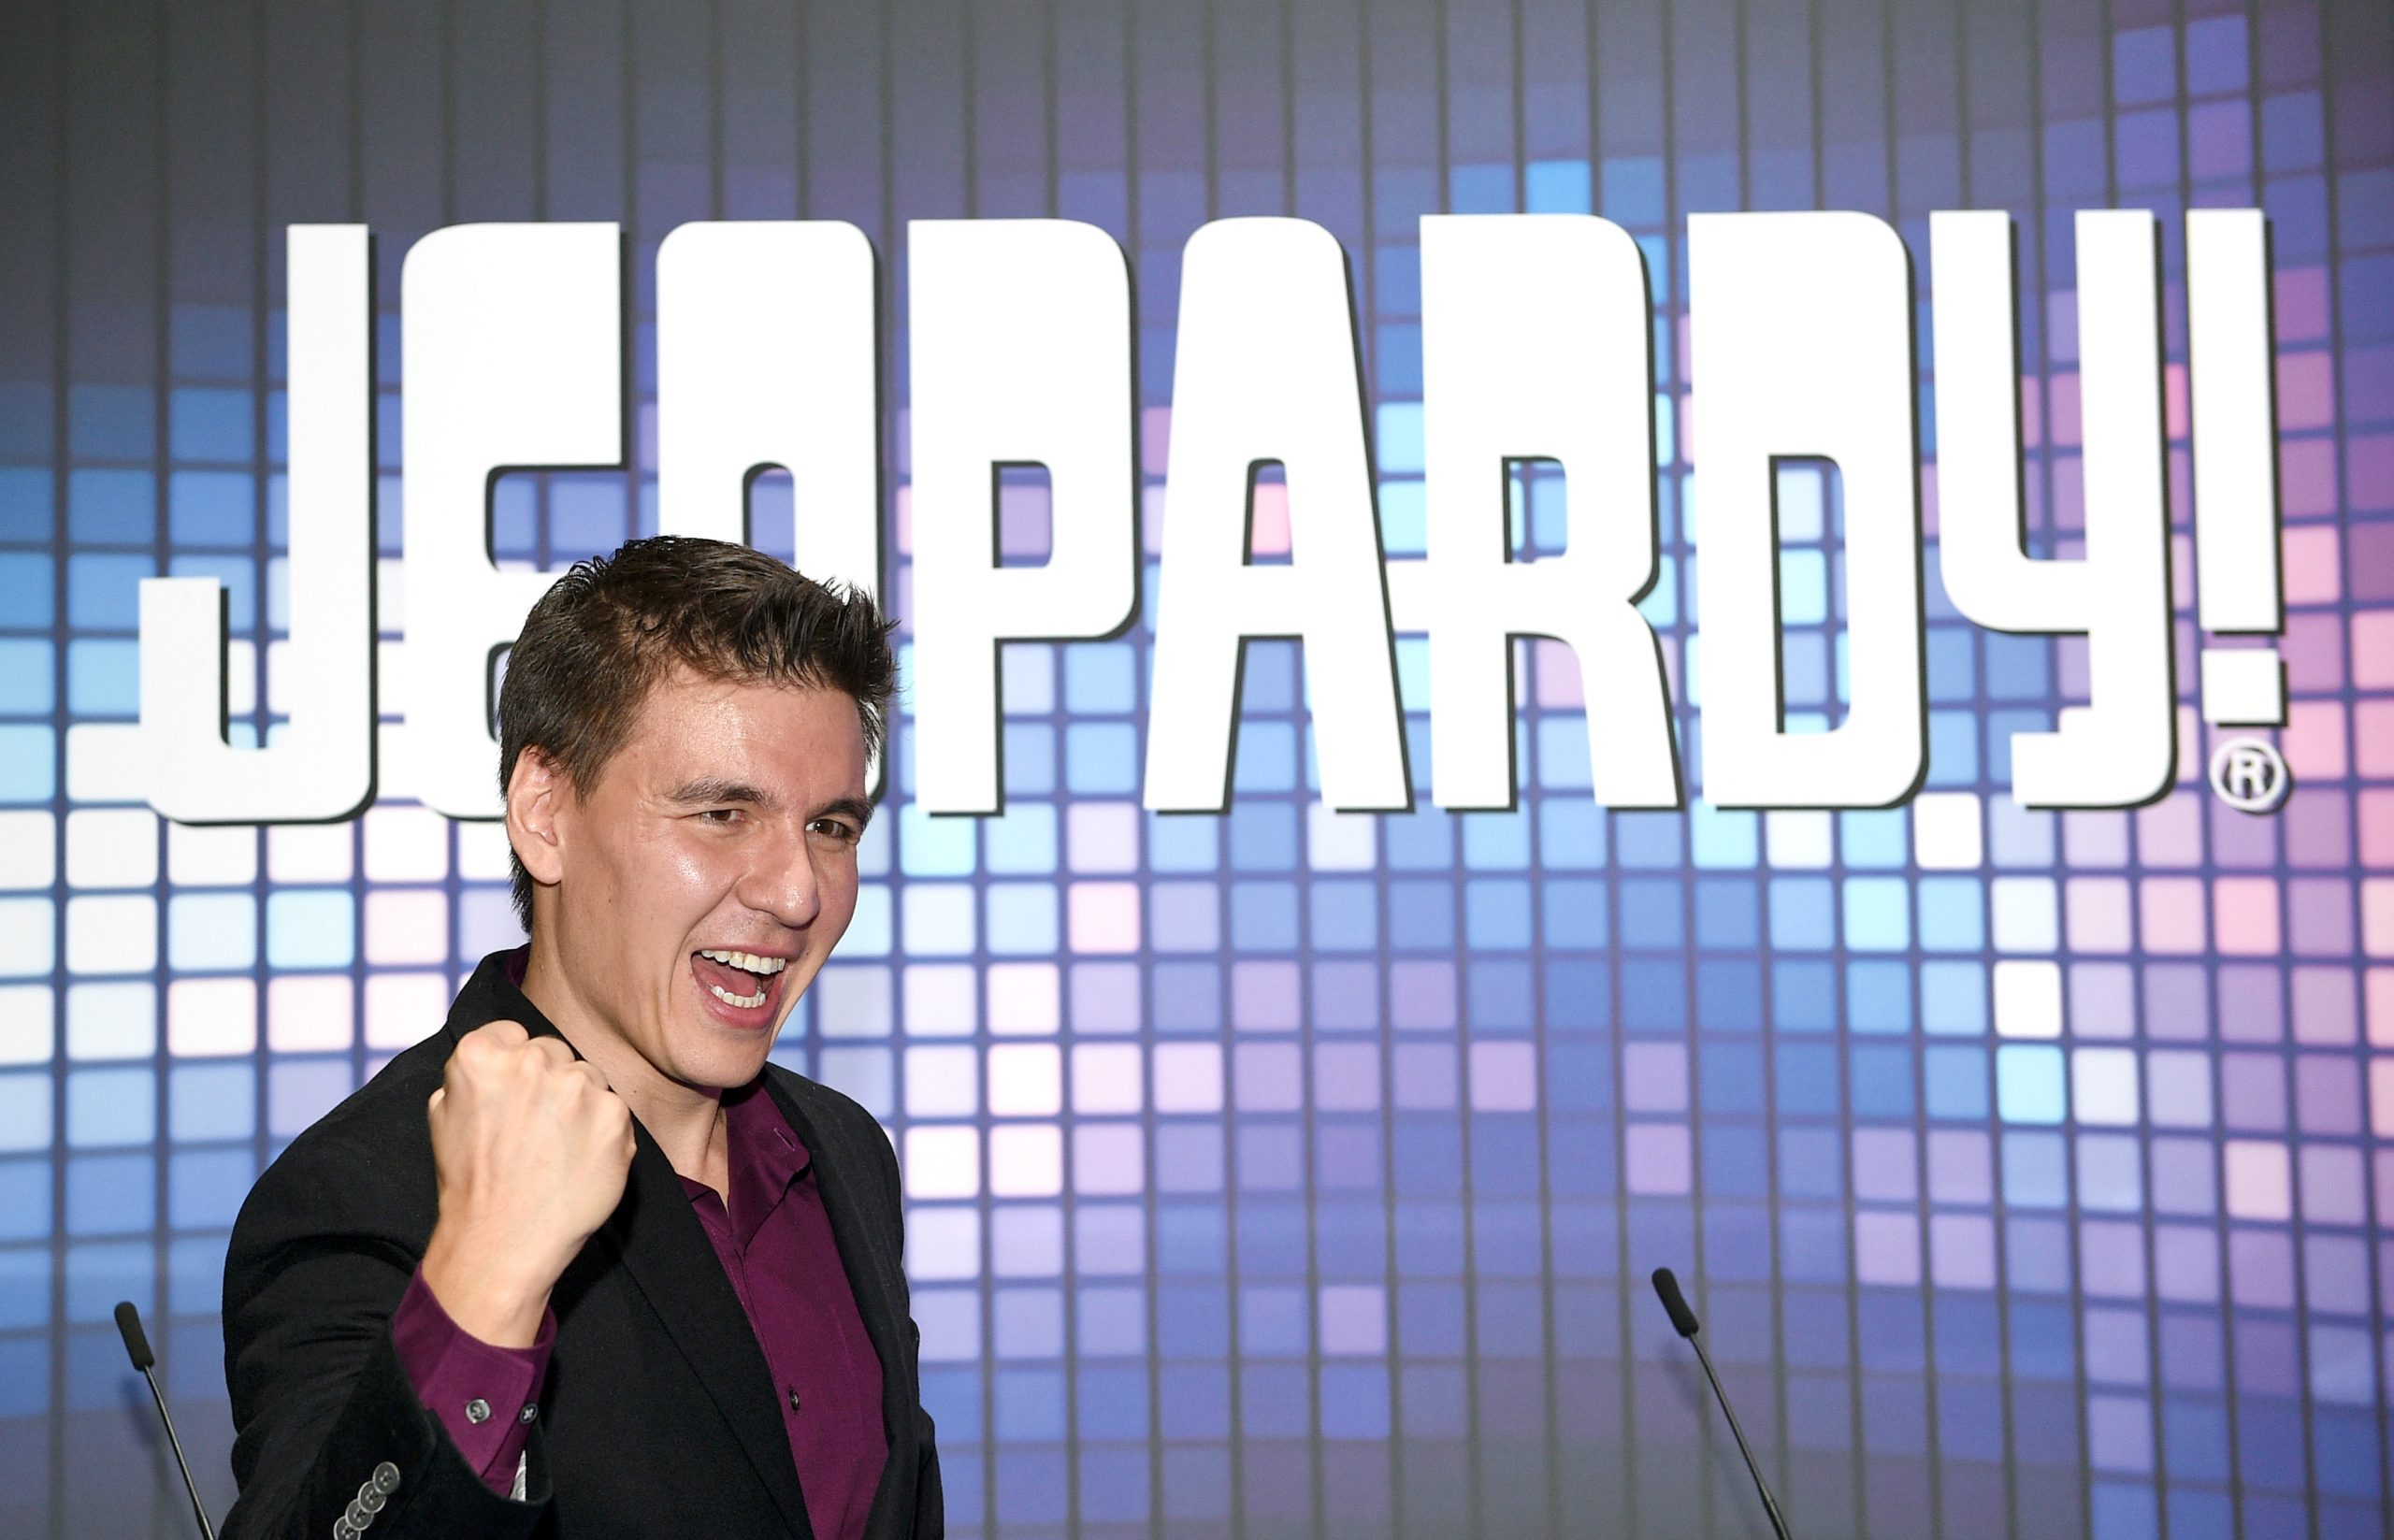 'Jeopardy!' champ James Holzhauer